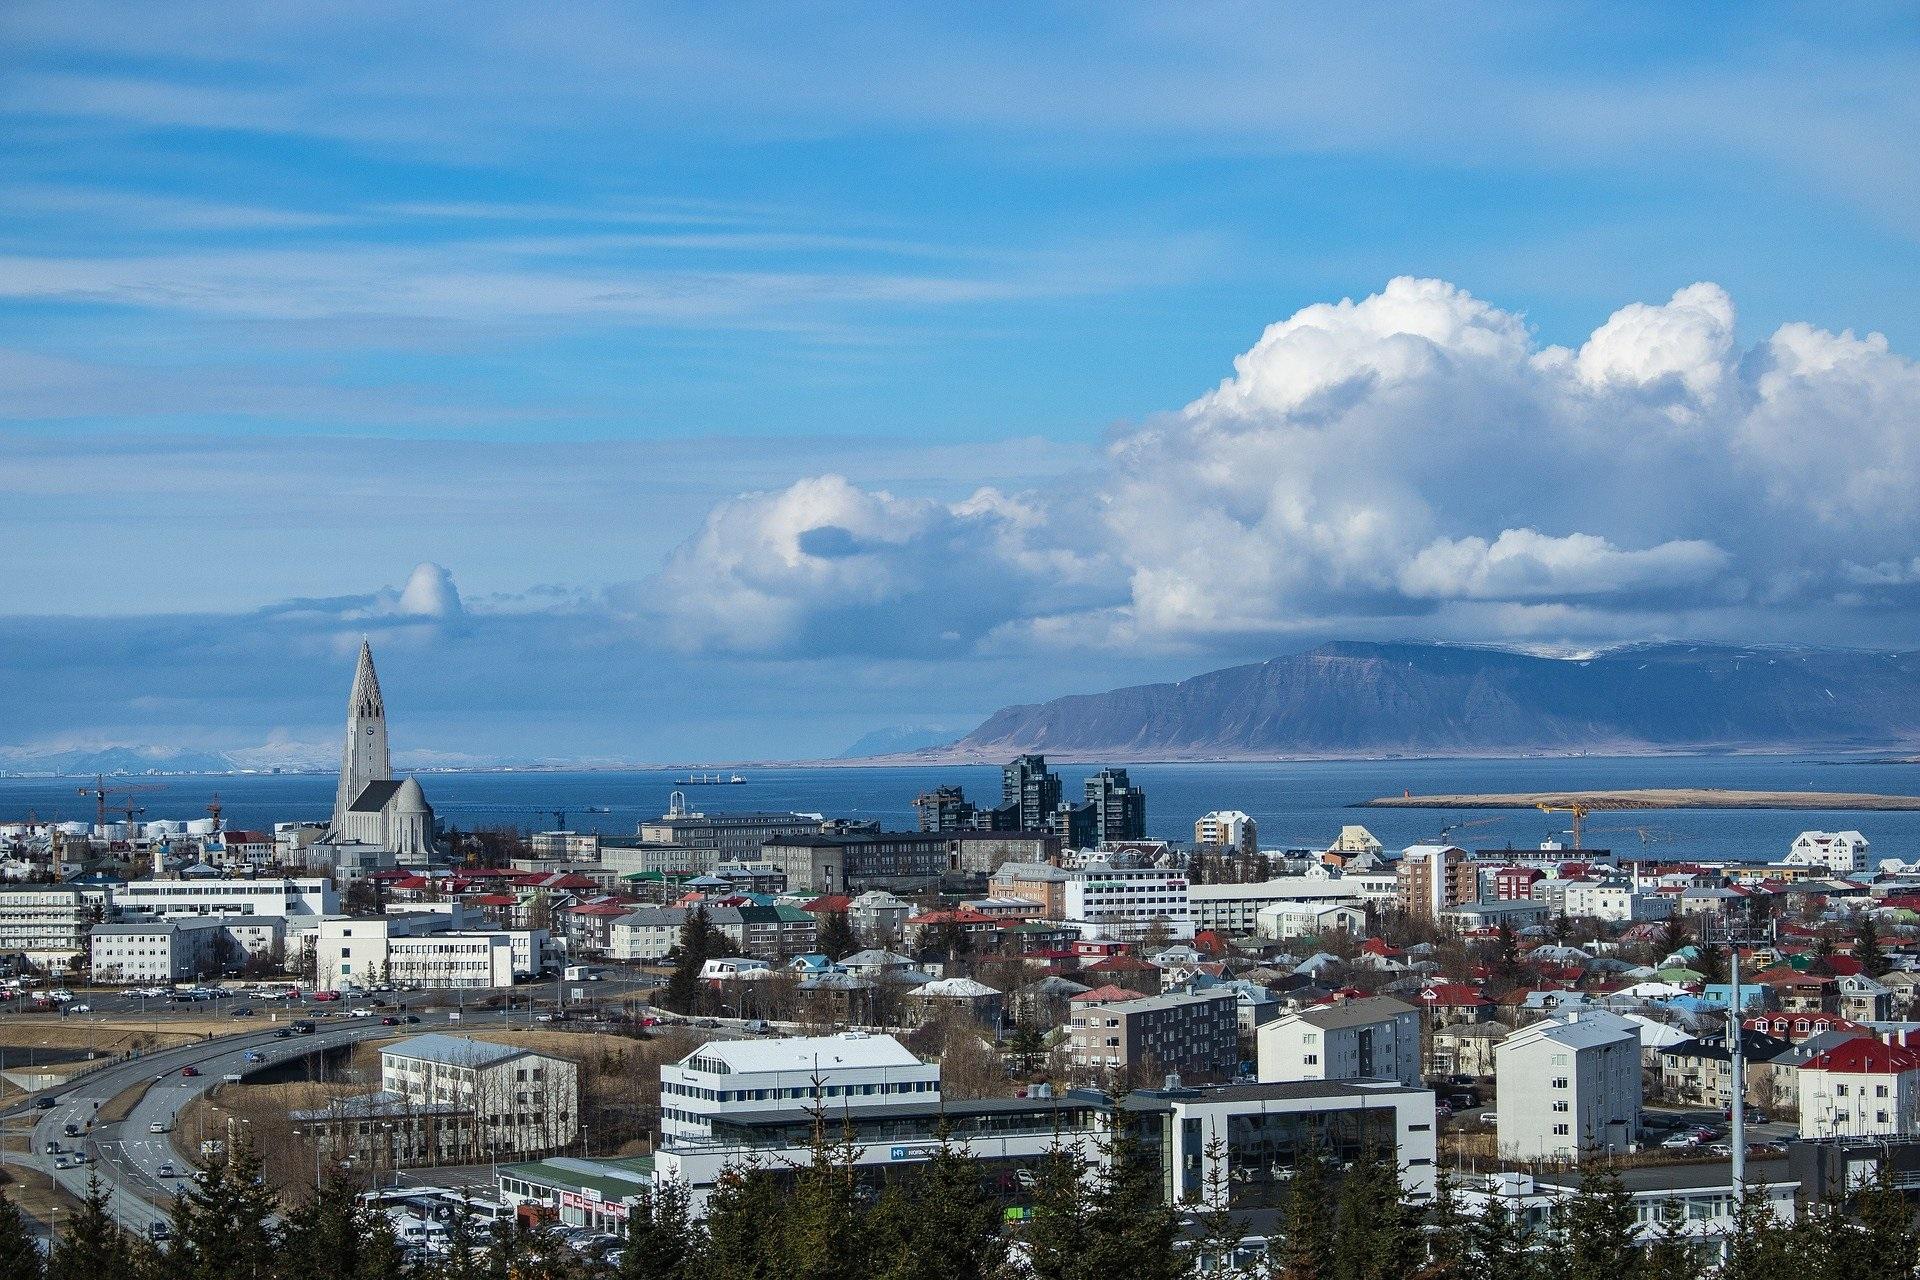 La ciudad de Reikiavik